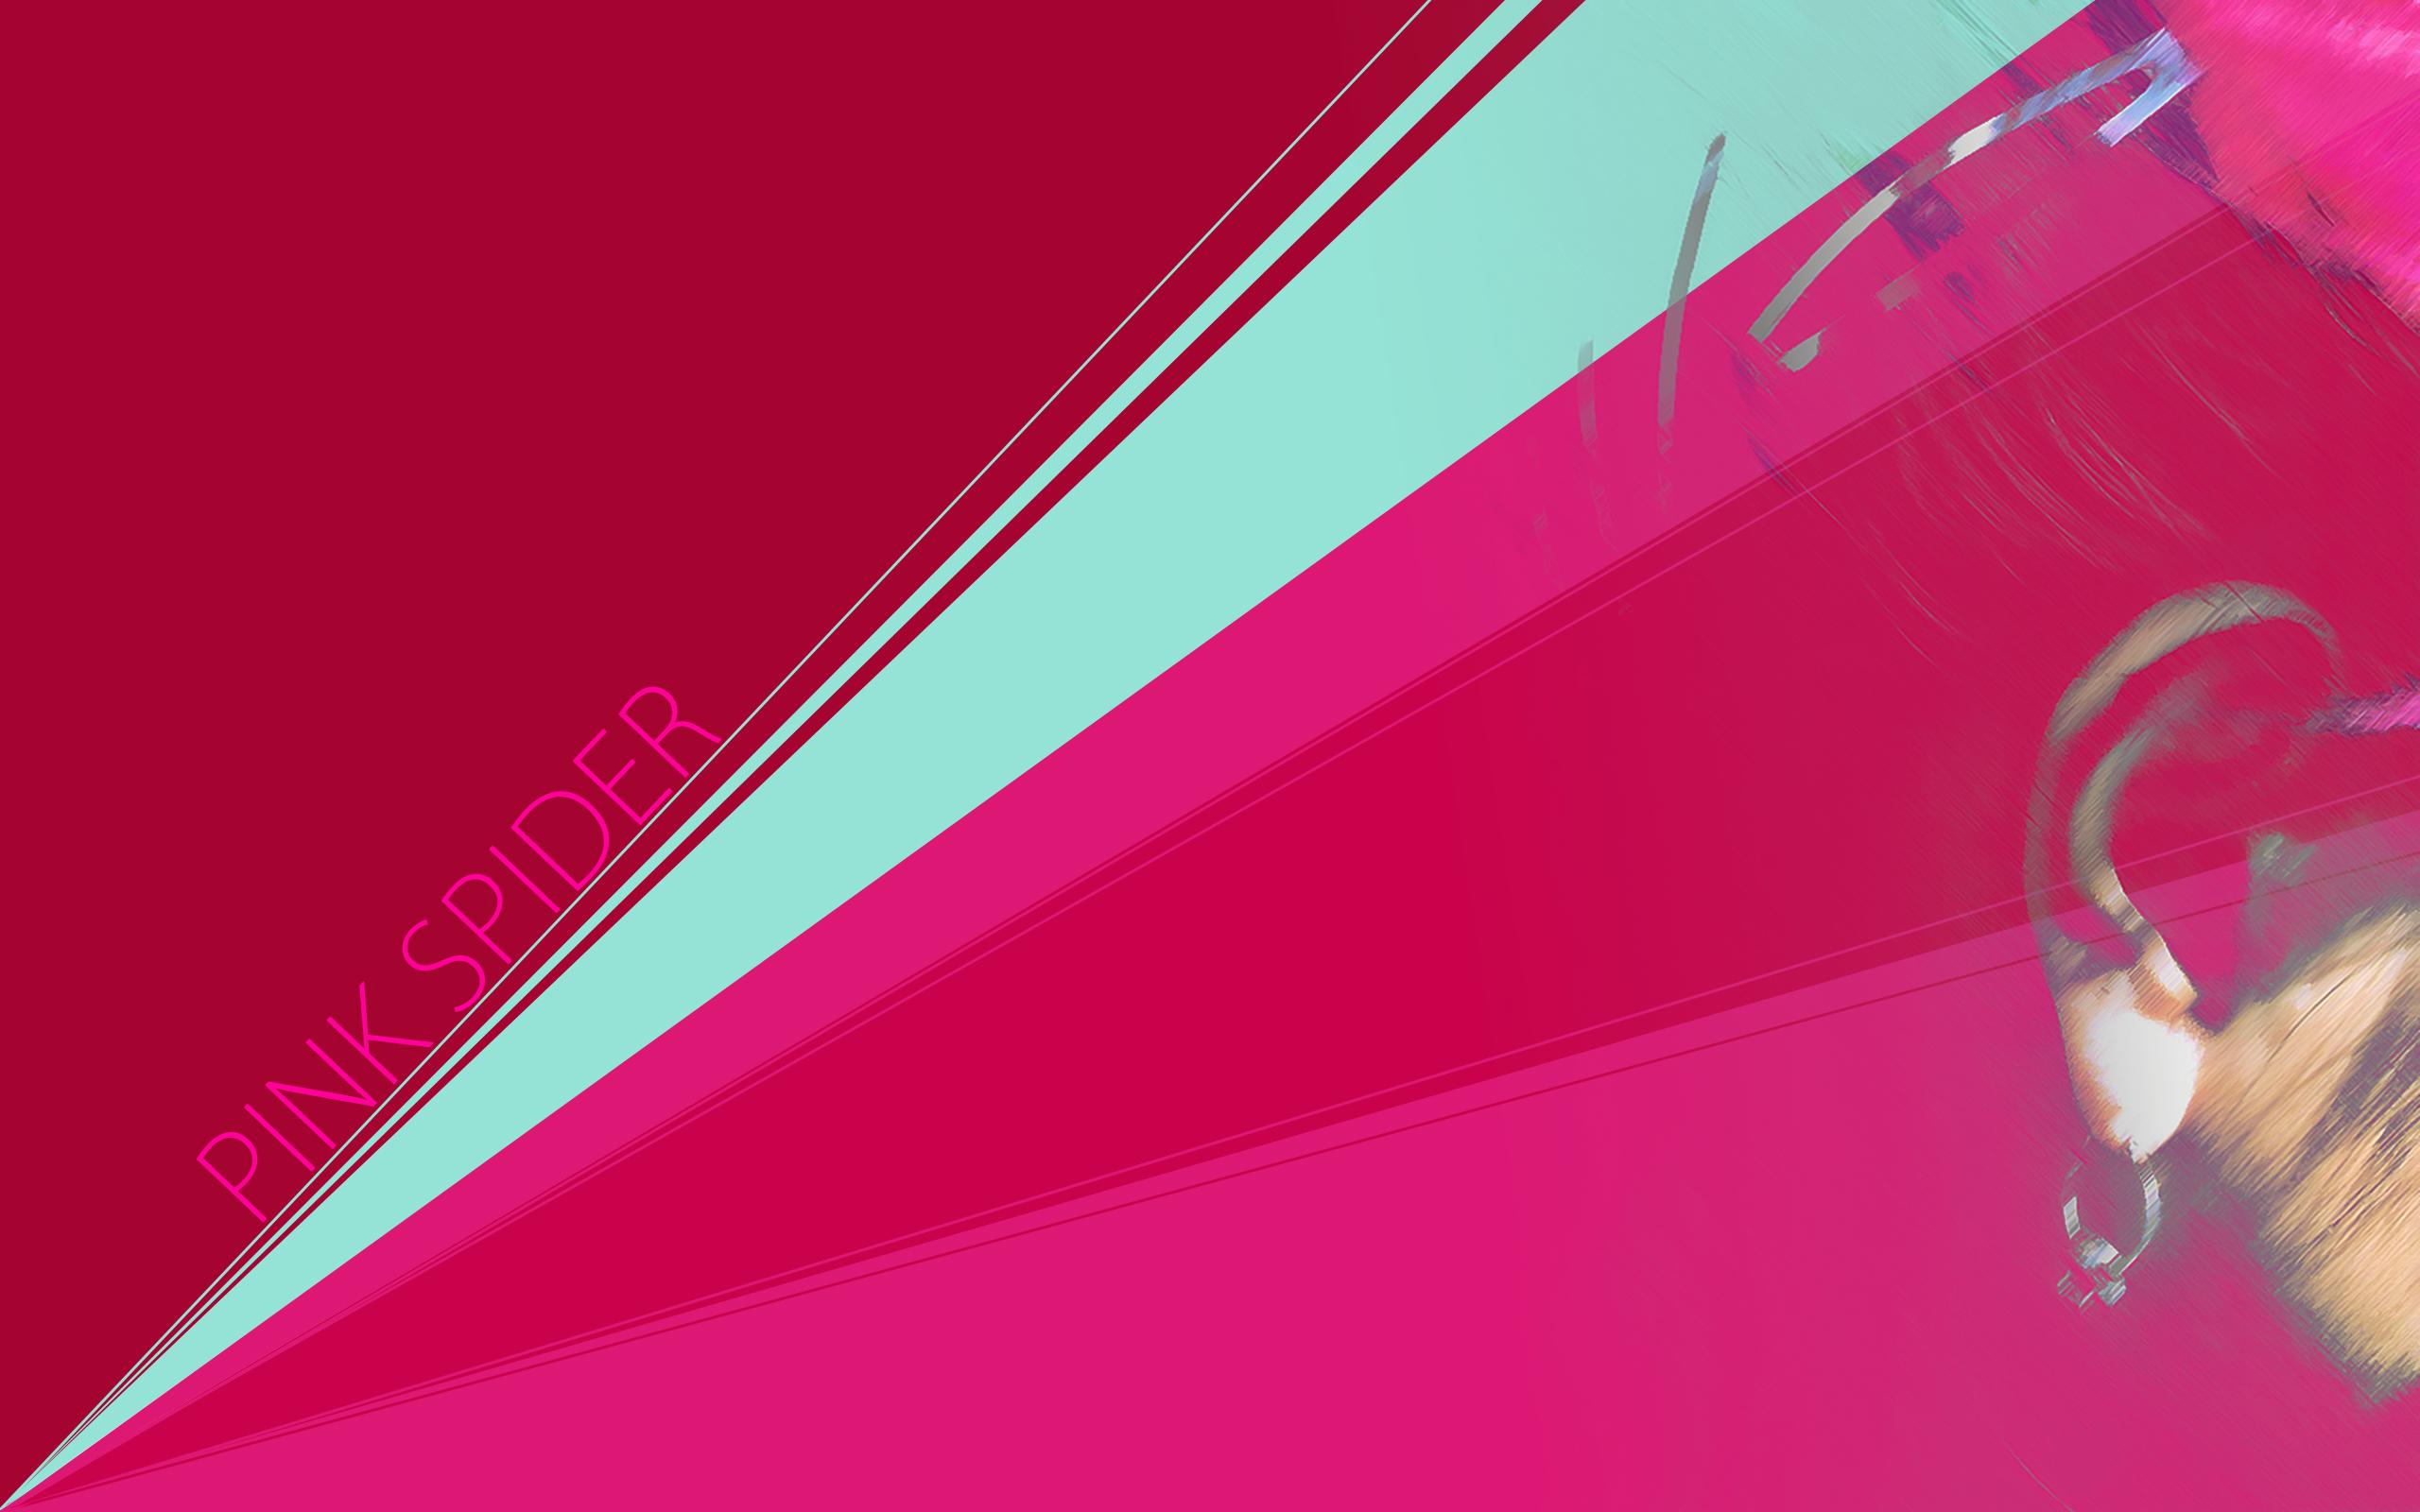 General 2560x1600 hide (musician) X Japan typography lines digital art red pink